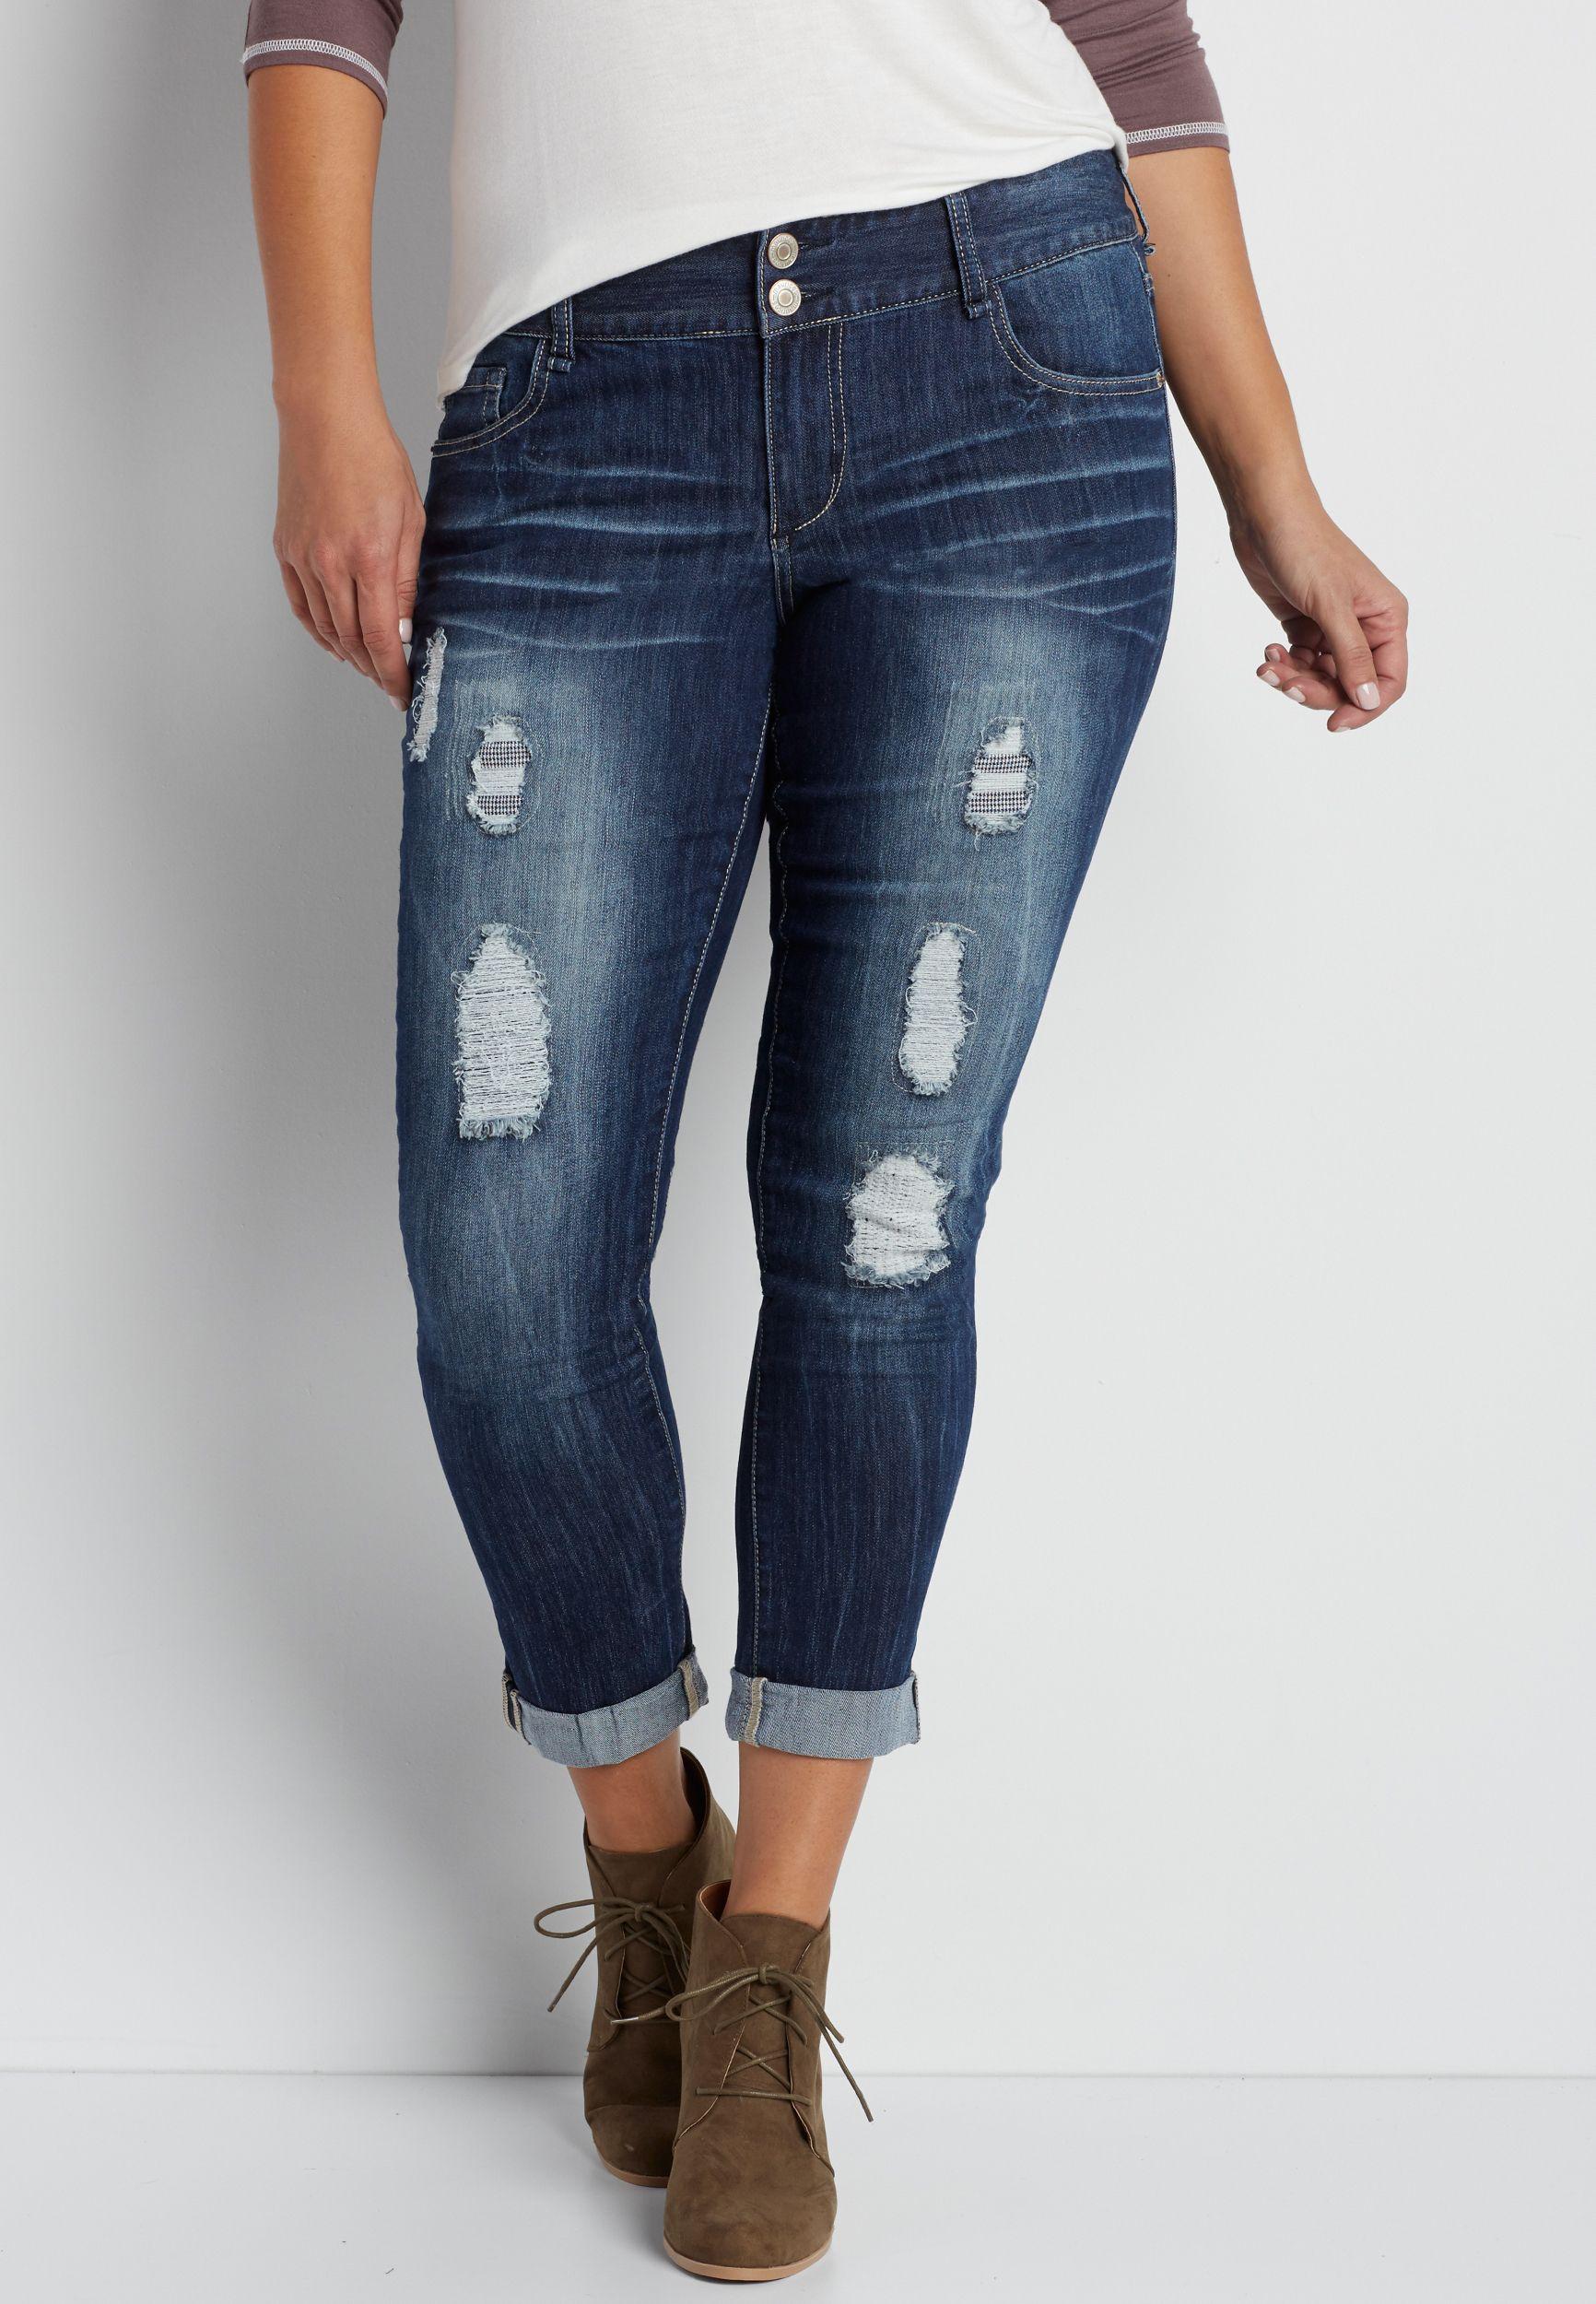 189e20ad3b9d0 DenimFlex™ plus size skinny boyfriend jeans with herringbone lined  destruction (original price